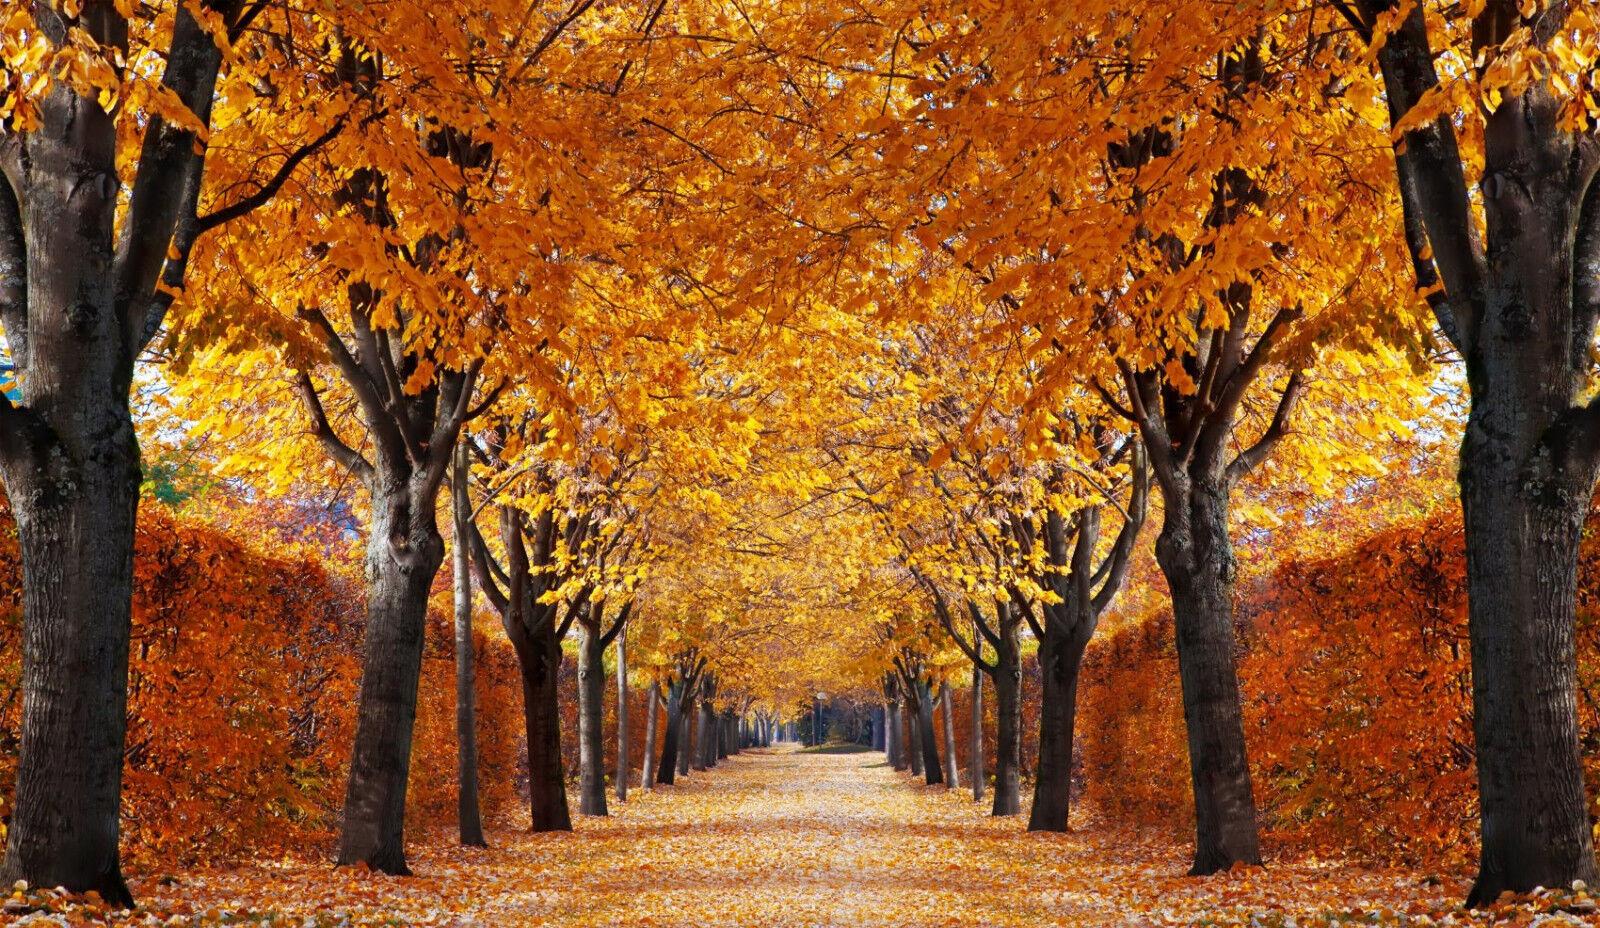 Fototapete-HERBST ALLEE-(333P)-350x260cm-7Bahnen 50x260cm-Bäume Garten XXL Natur